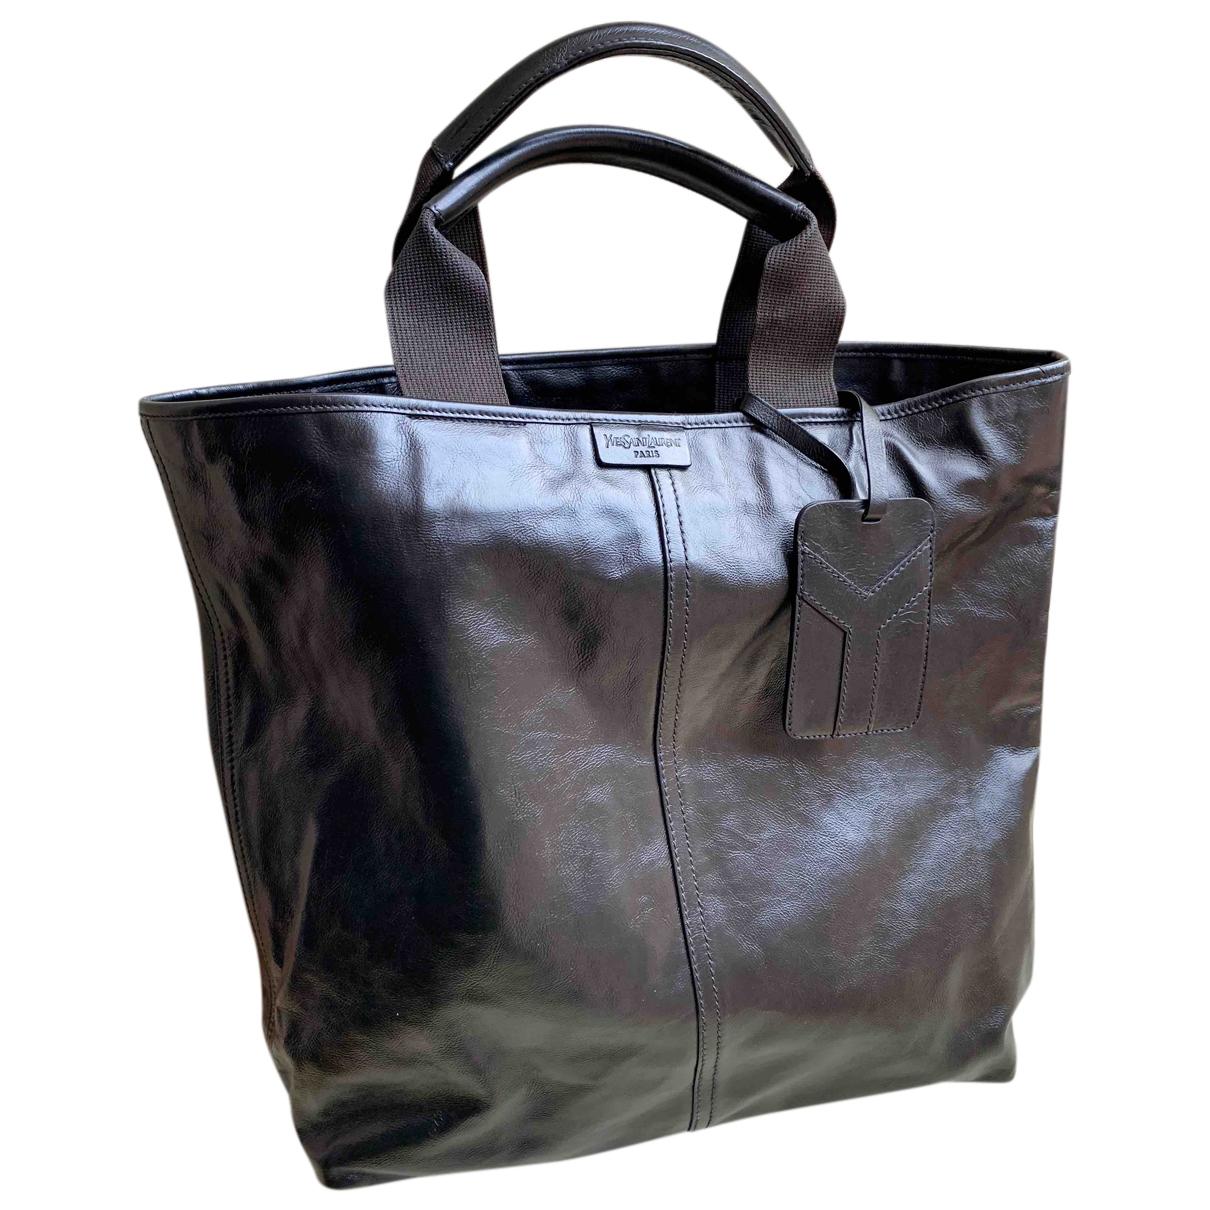 Yves Saint Laurent N Brown Leather handbag for Women N